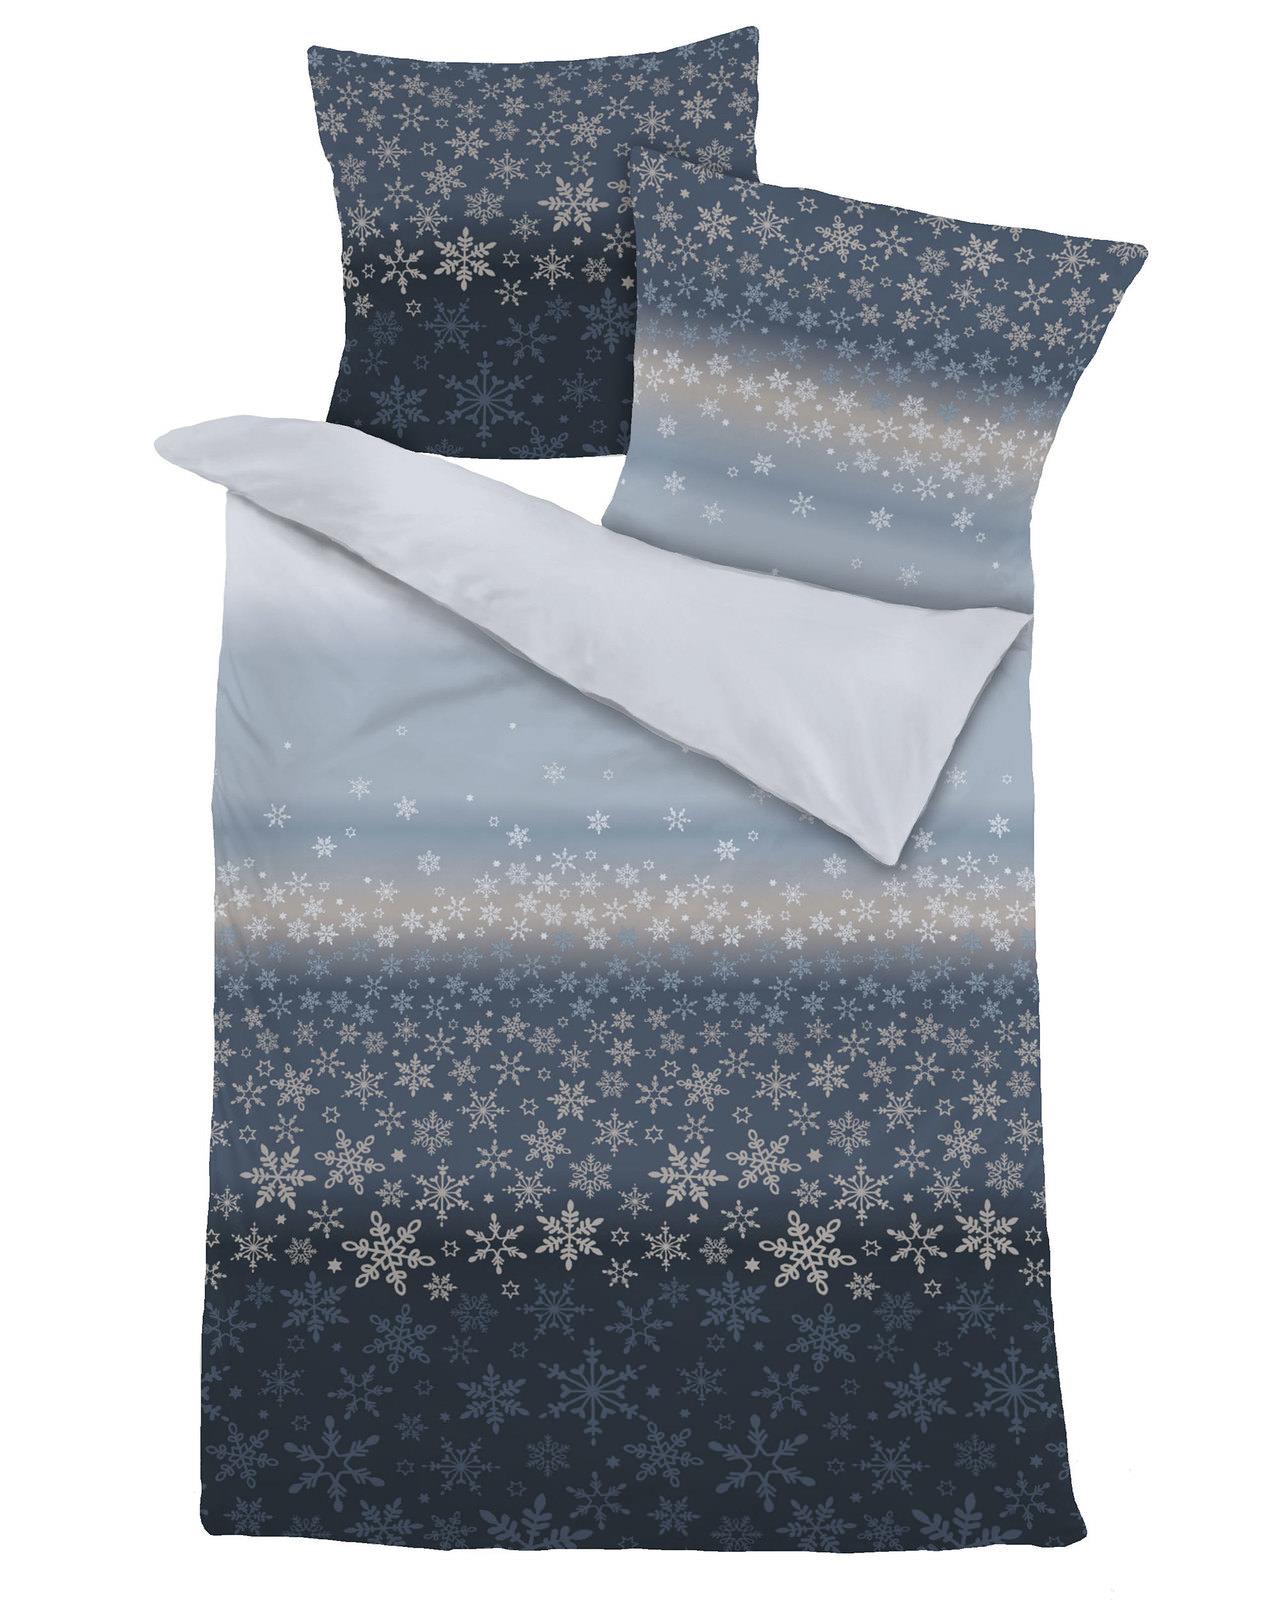 Dormisette Dormisette Biber Bettwäsche Blau Online Entdecken